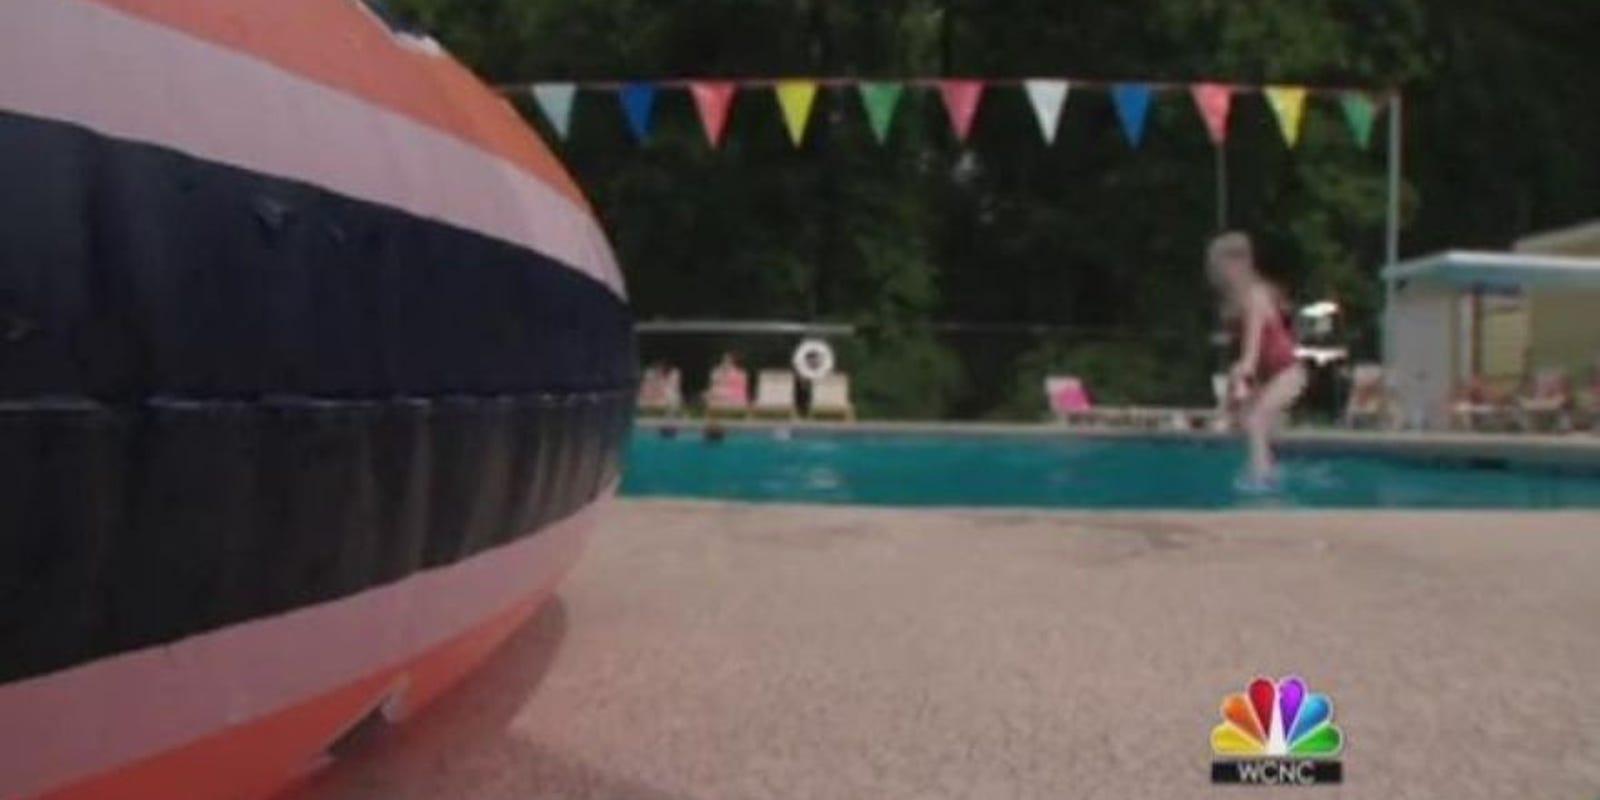 Swimming Pool Water Contamination : Swimming pool water contamination increasing in the u s